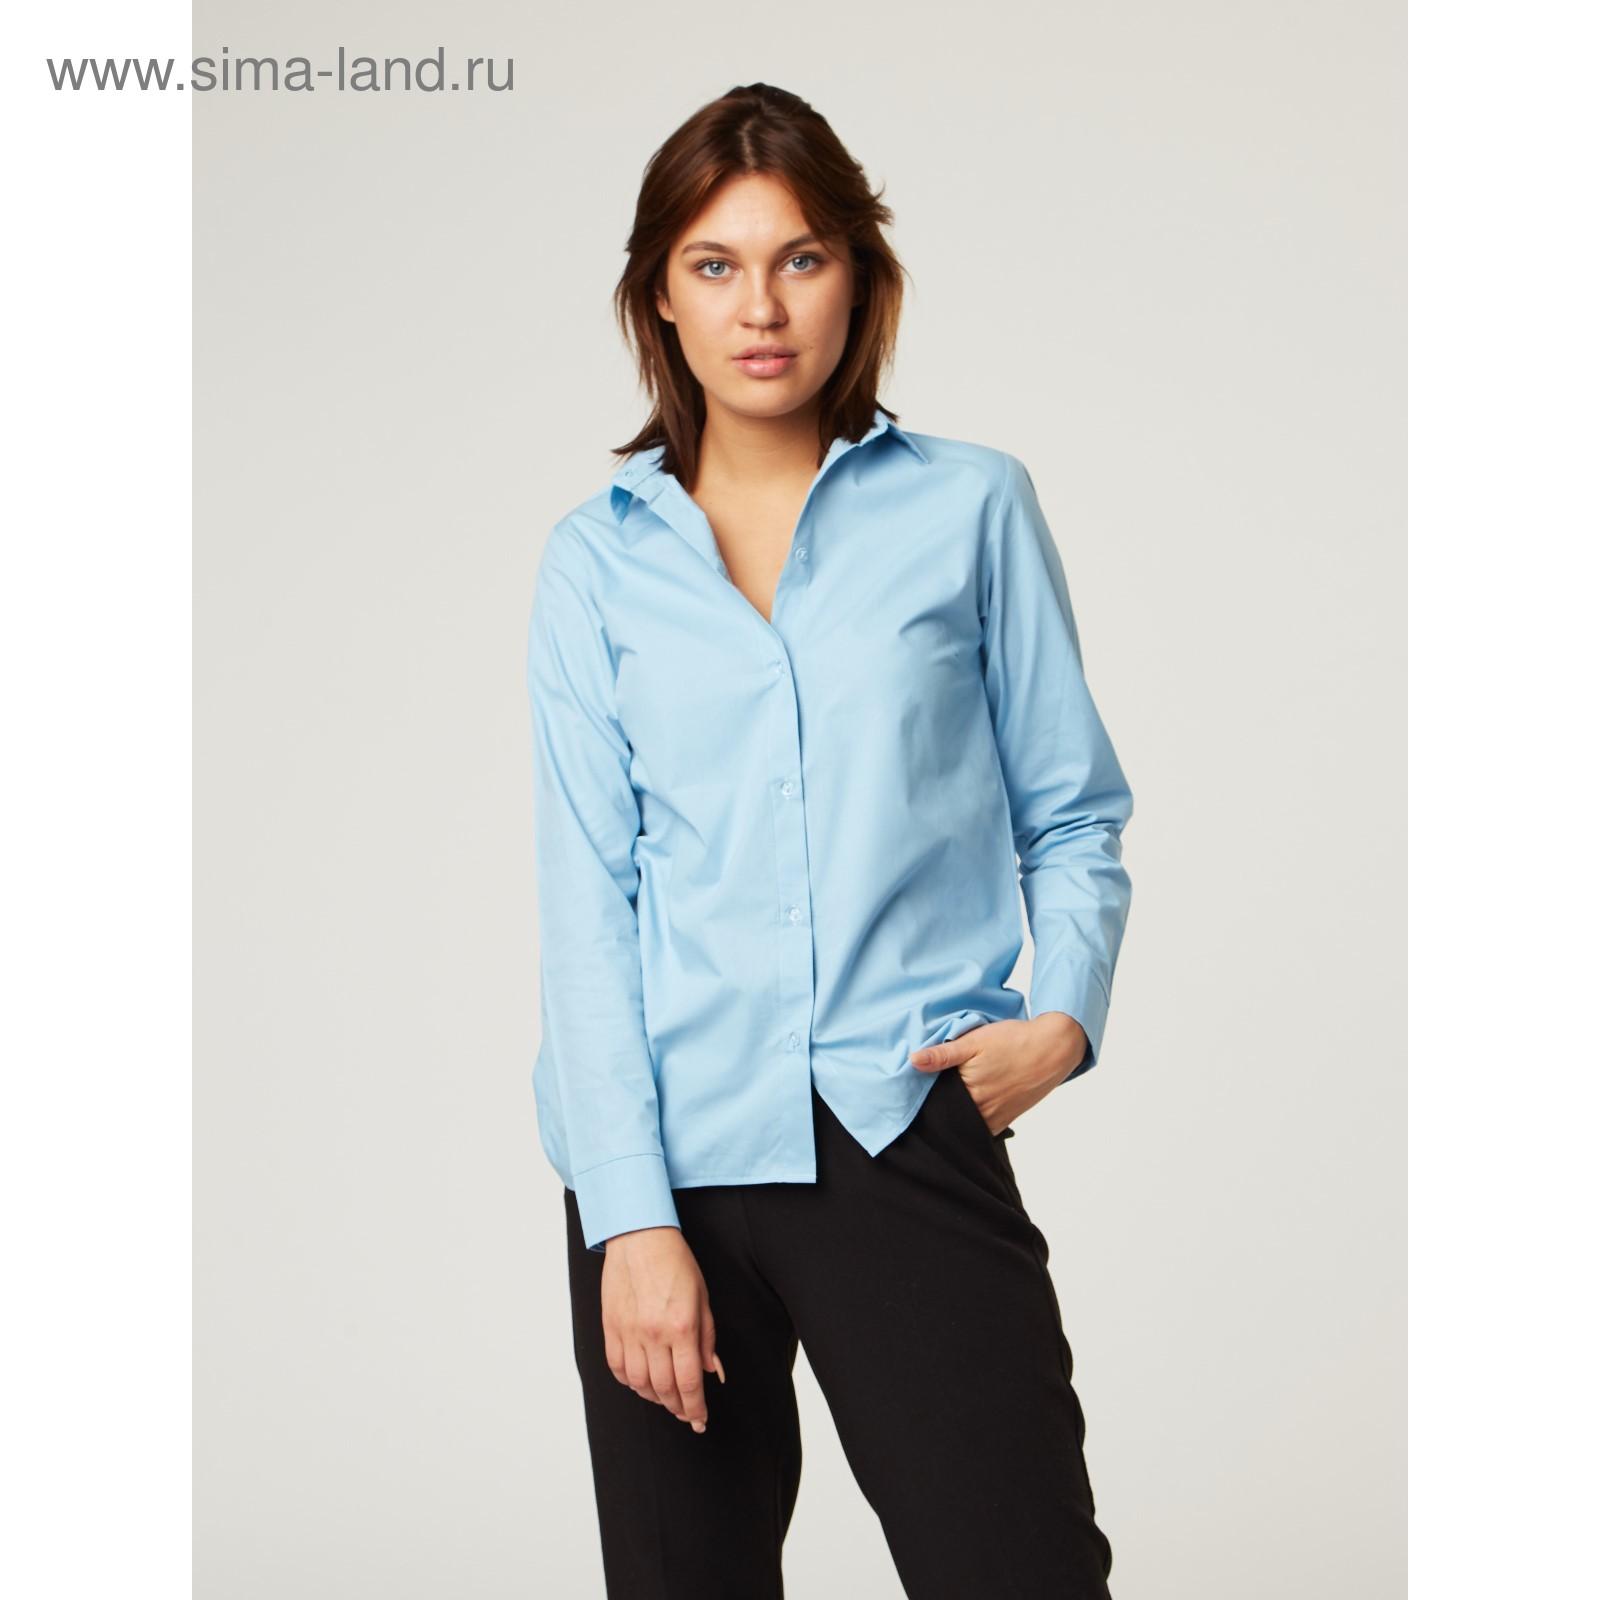 Рубашка женская трапеция 437b00e30fb7e